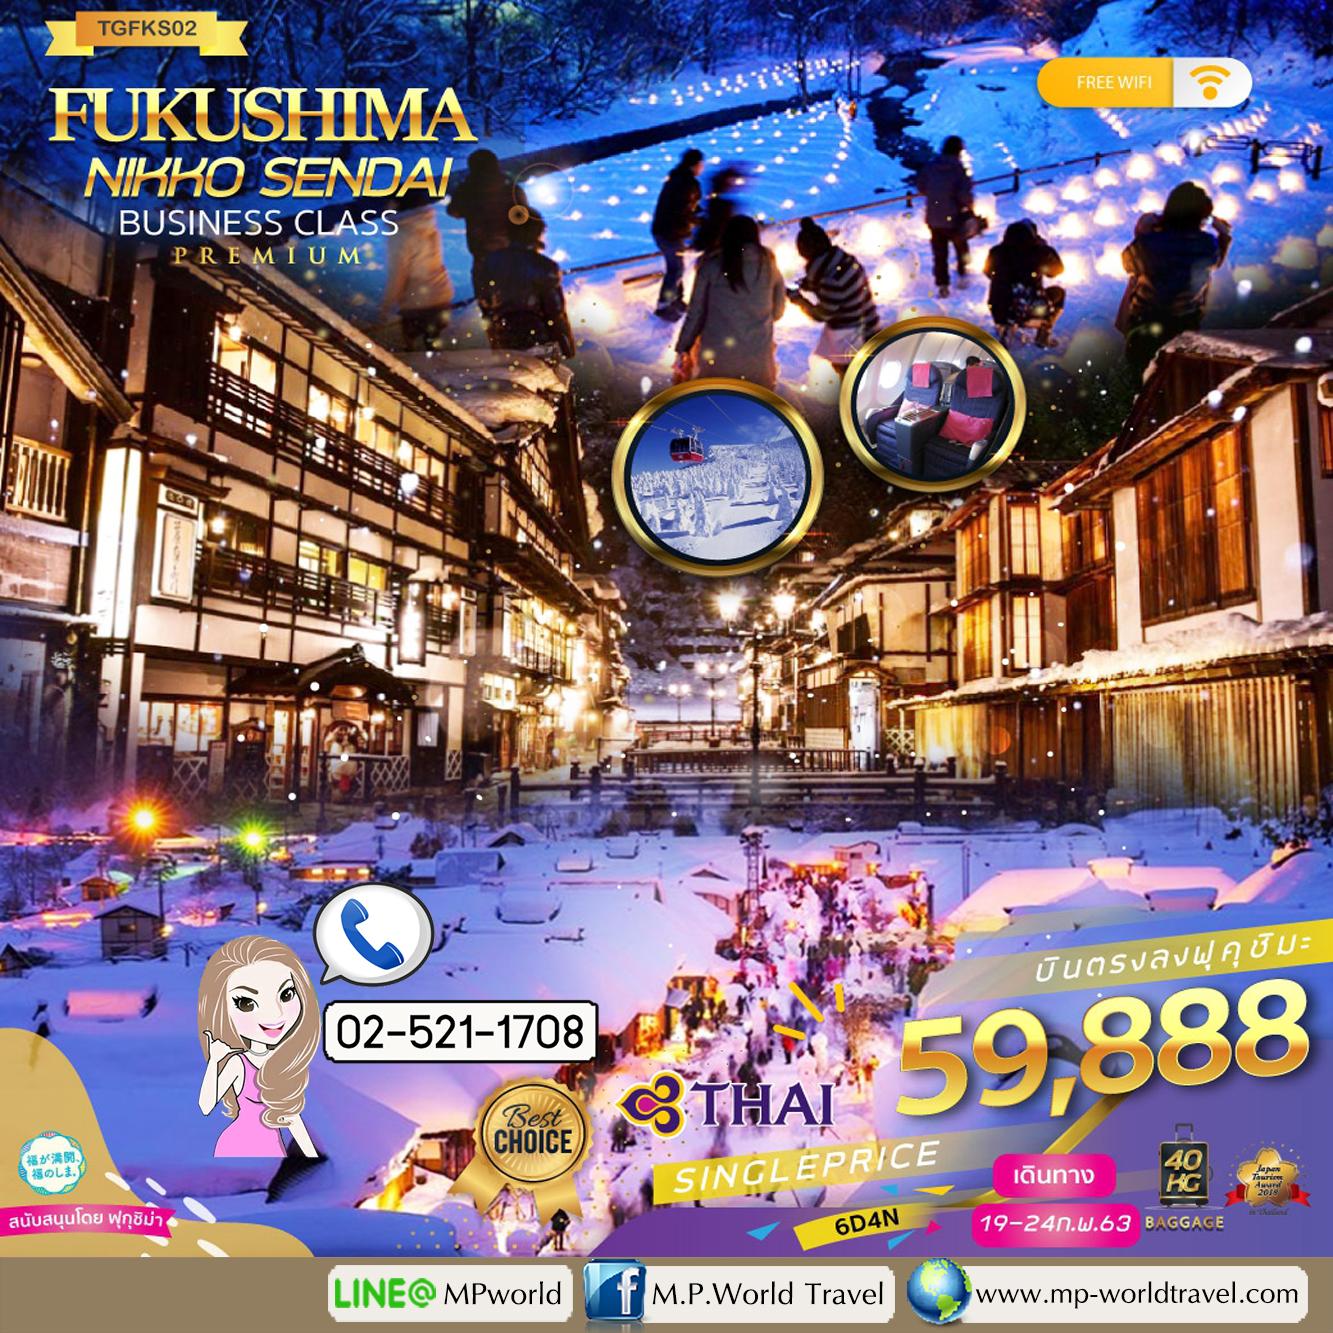 TGFKS02 FUKUSHIMA NIKKO SENDAI PREMIUM BUSINESS CLASS 6D 4N TG